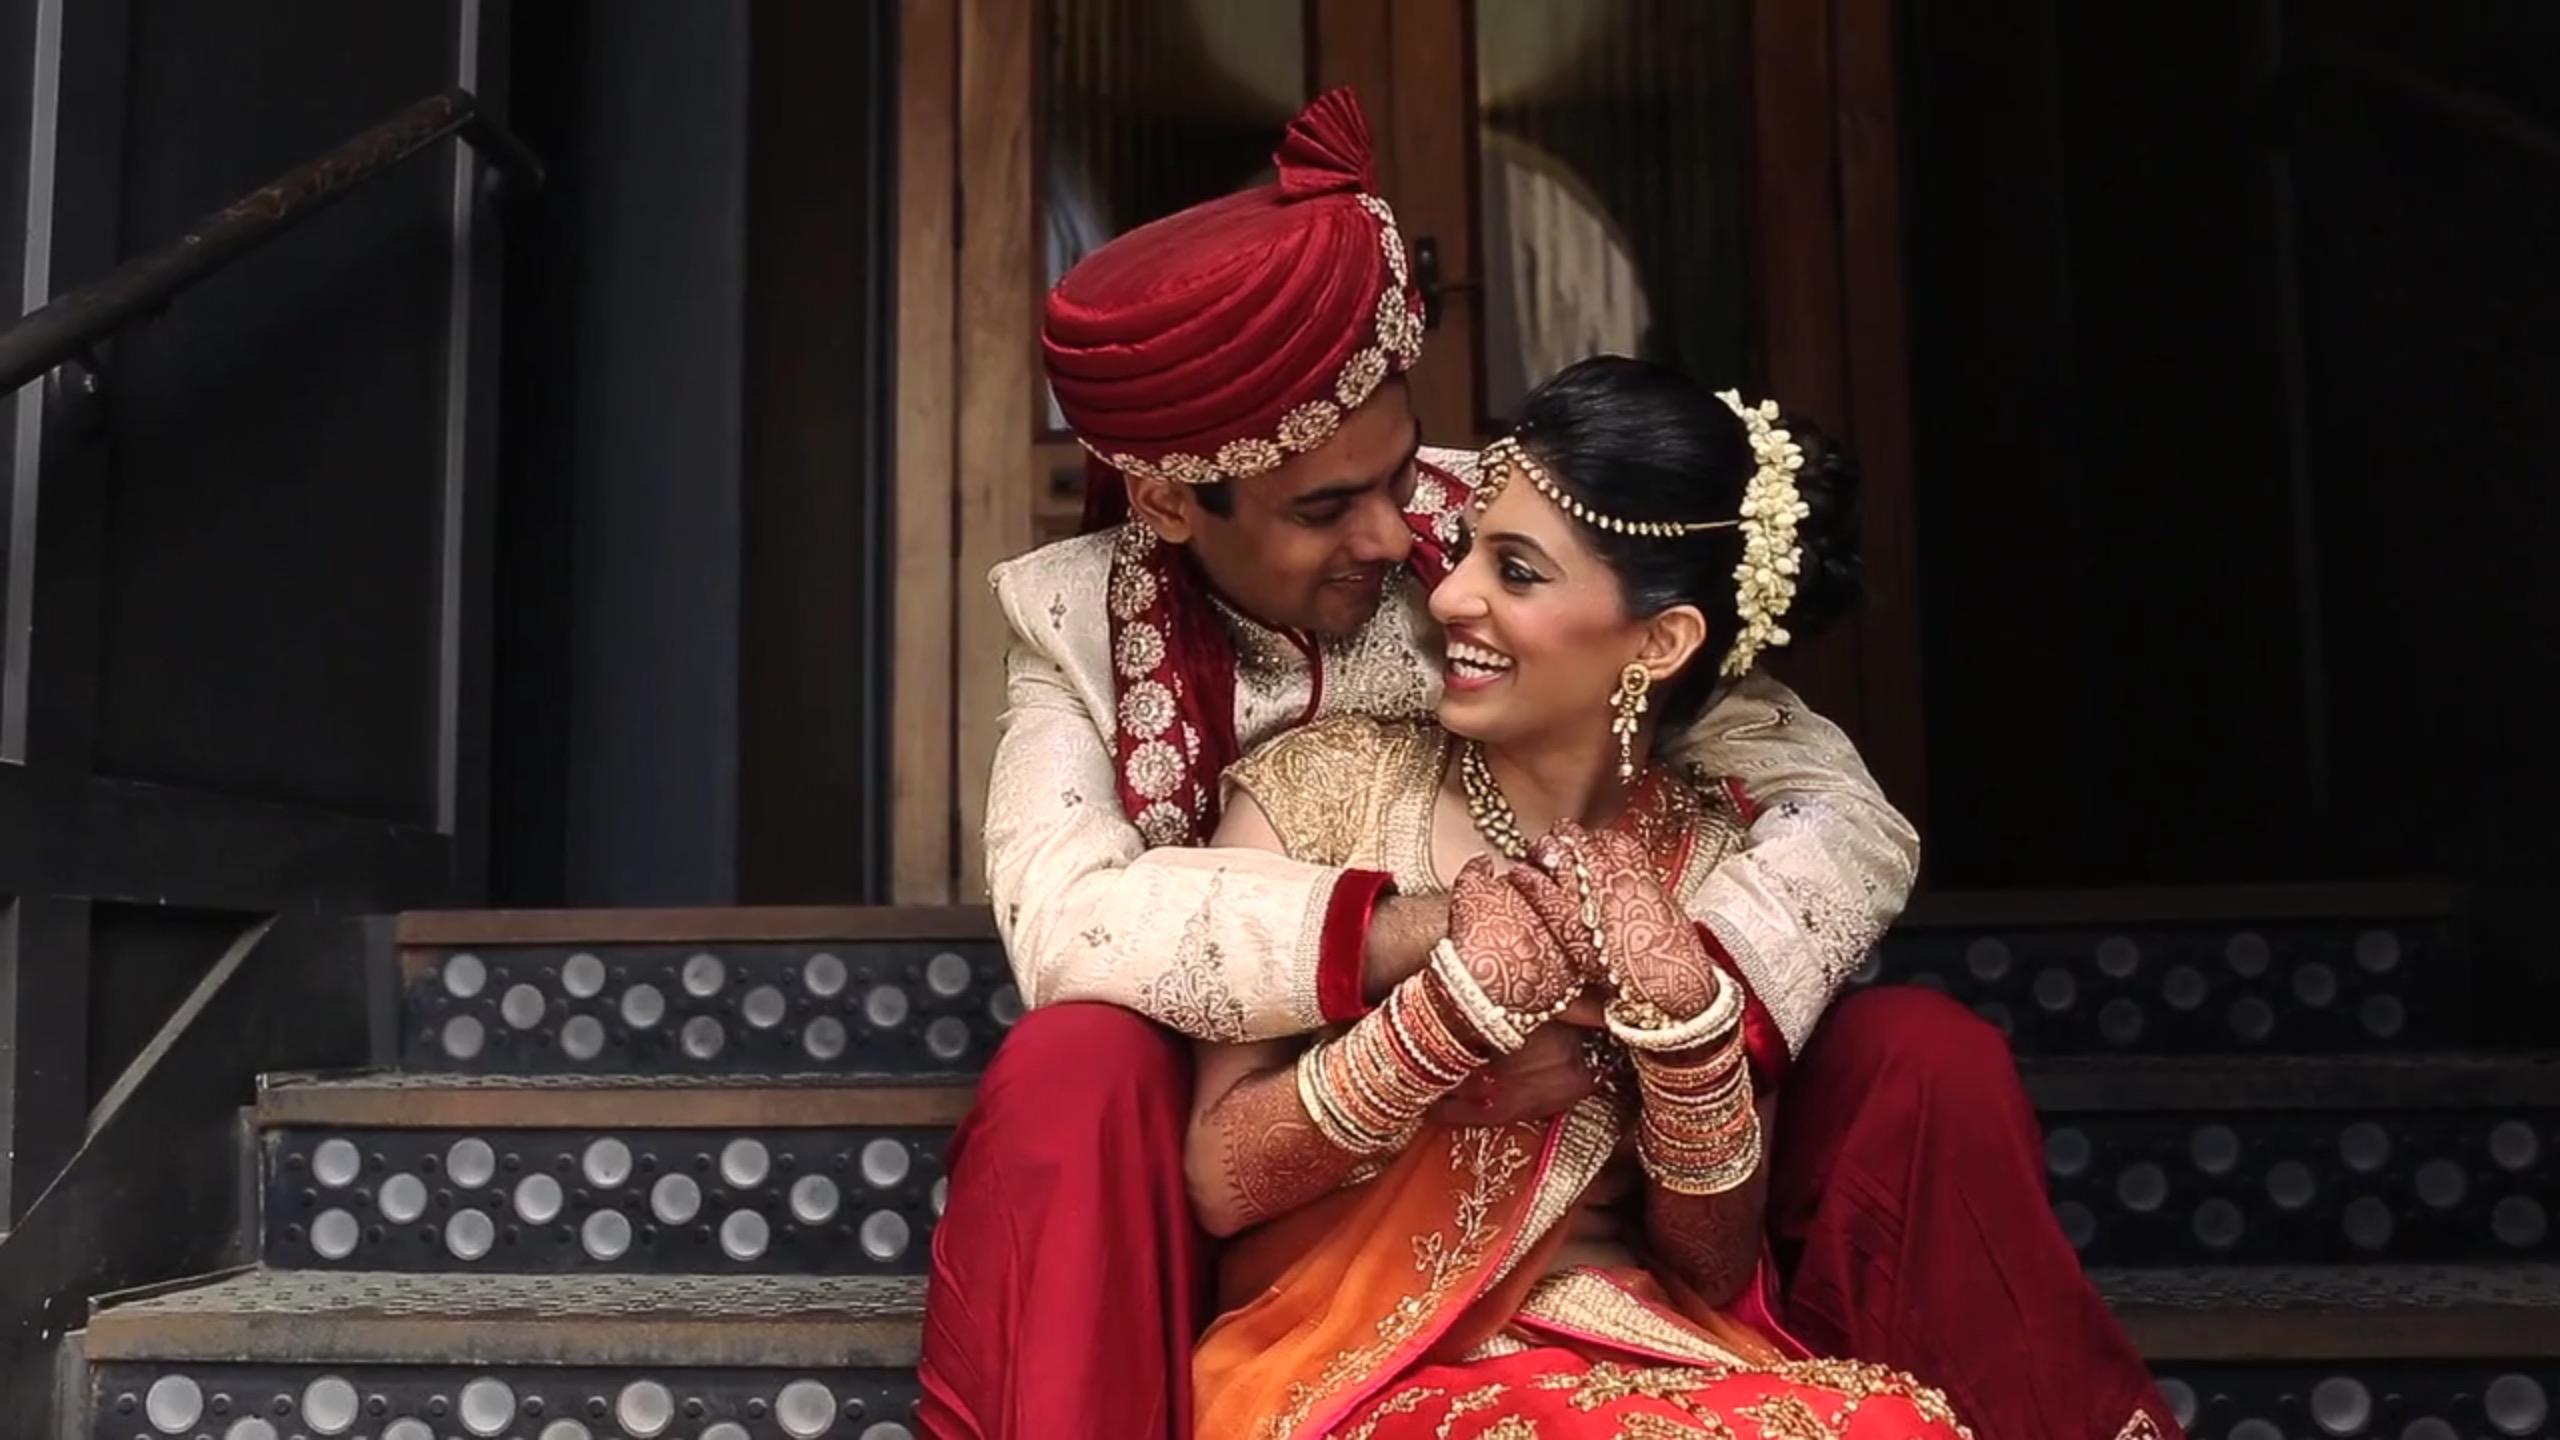 Ruchi Kushan Renaissance Boston Waterfront Indian Wedding - Photography Indian Wedding Hd - HD Wallpaper